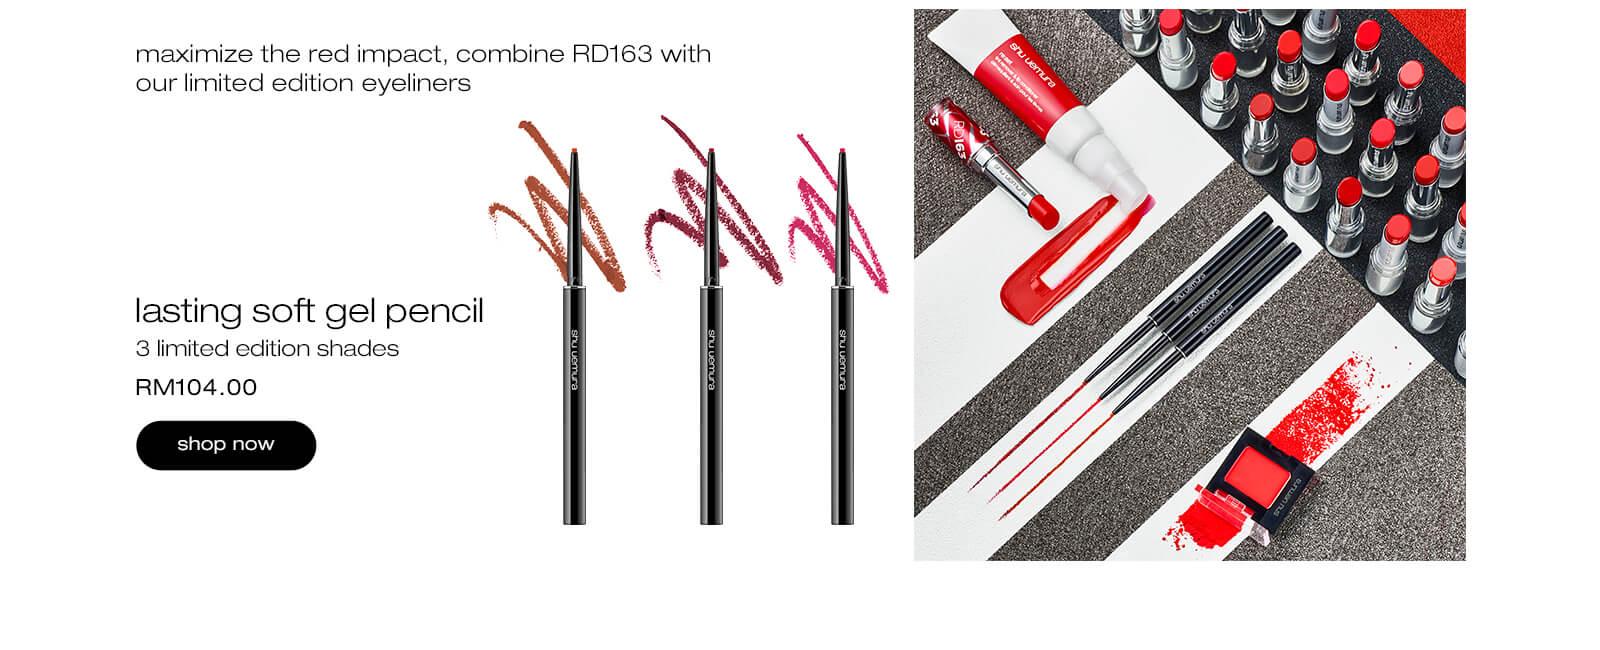 Shu uemura REDS #RD163 Lasting Soft Gel Pencil